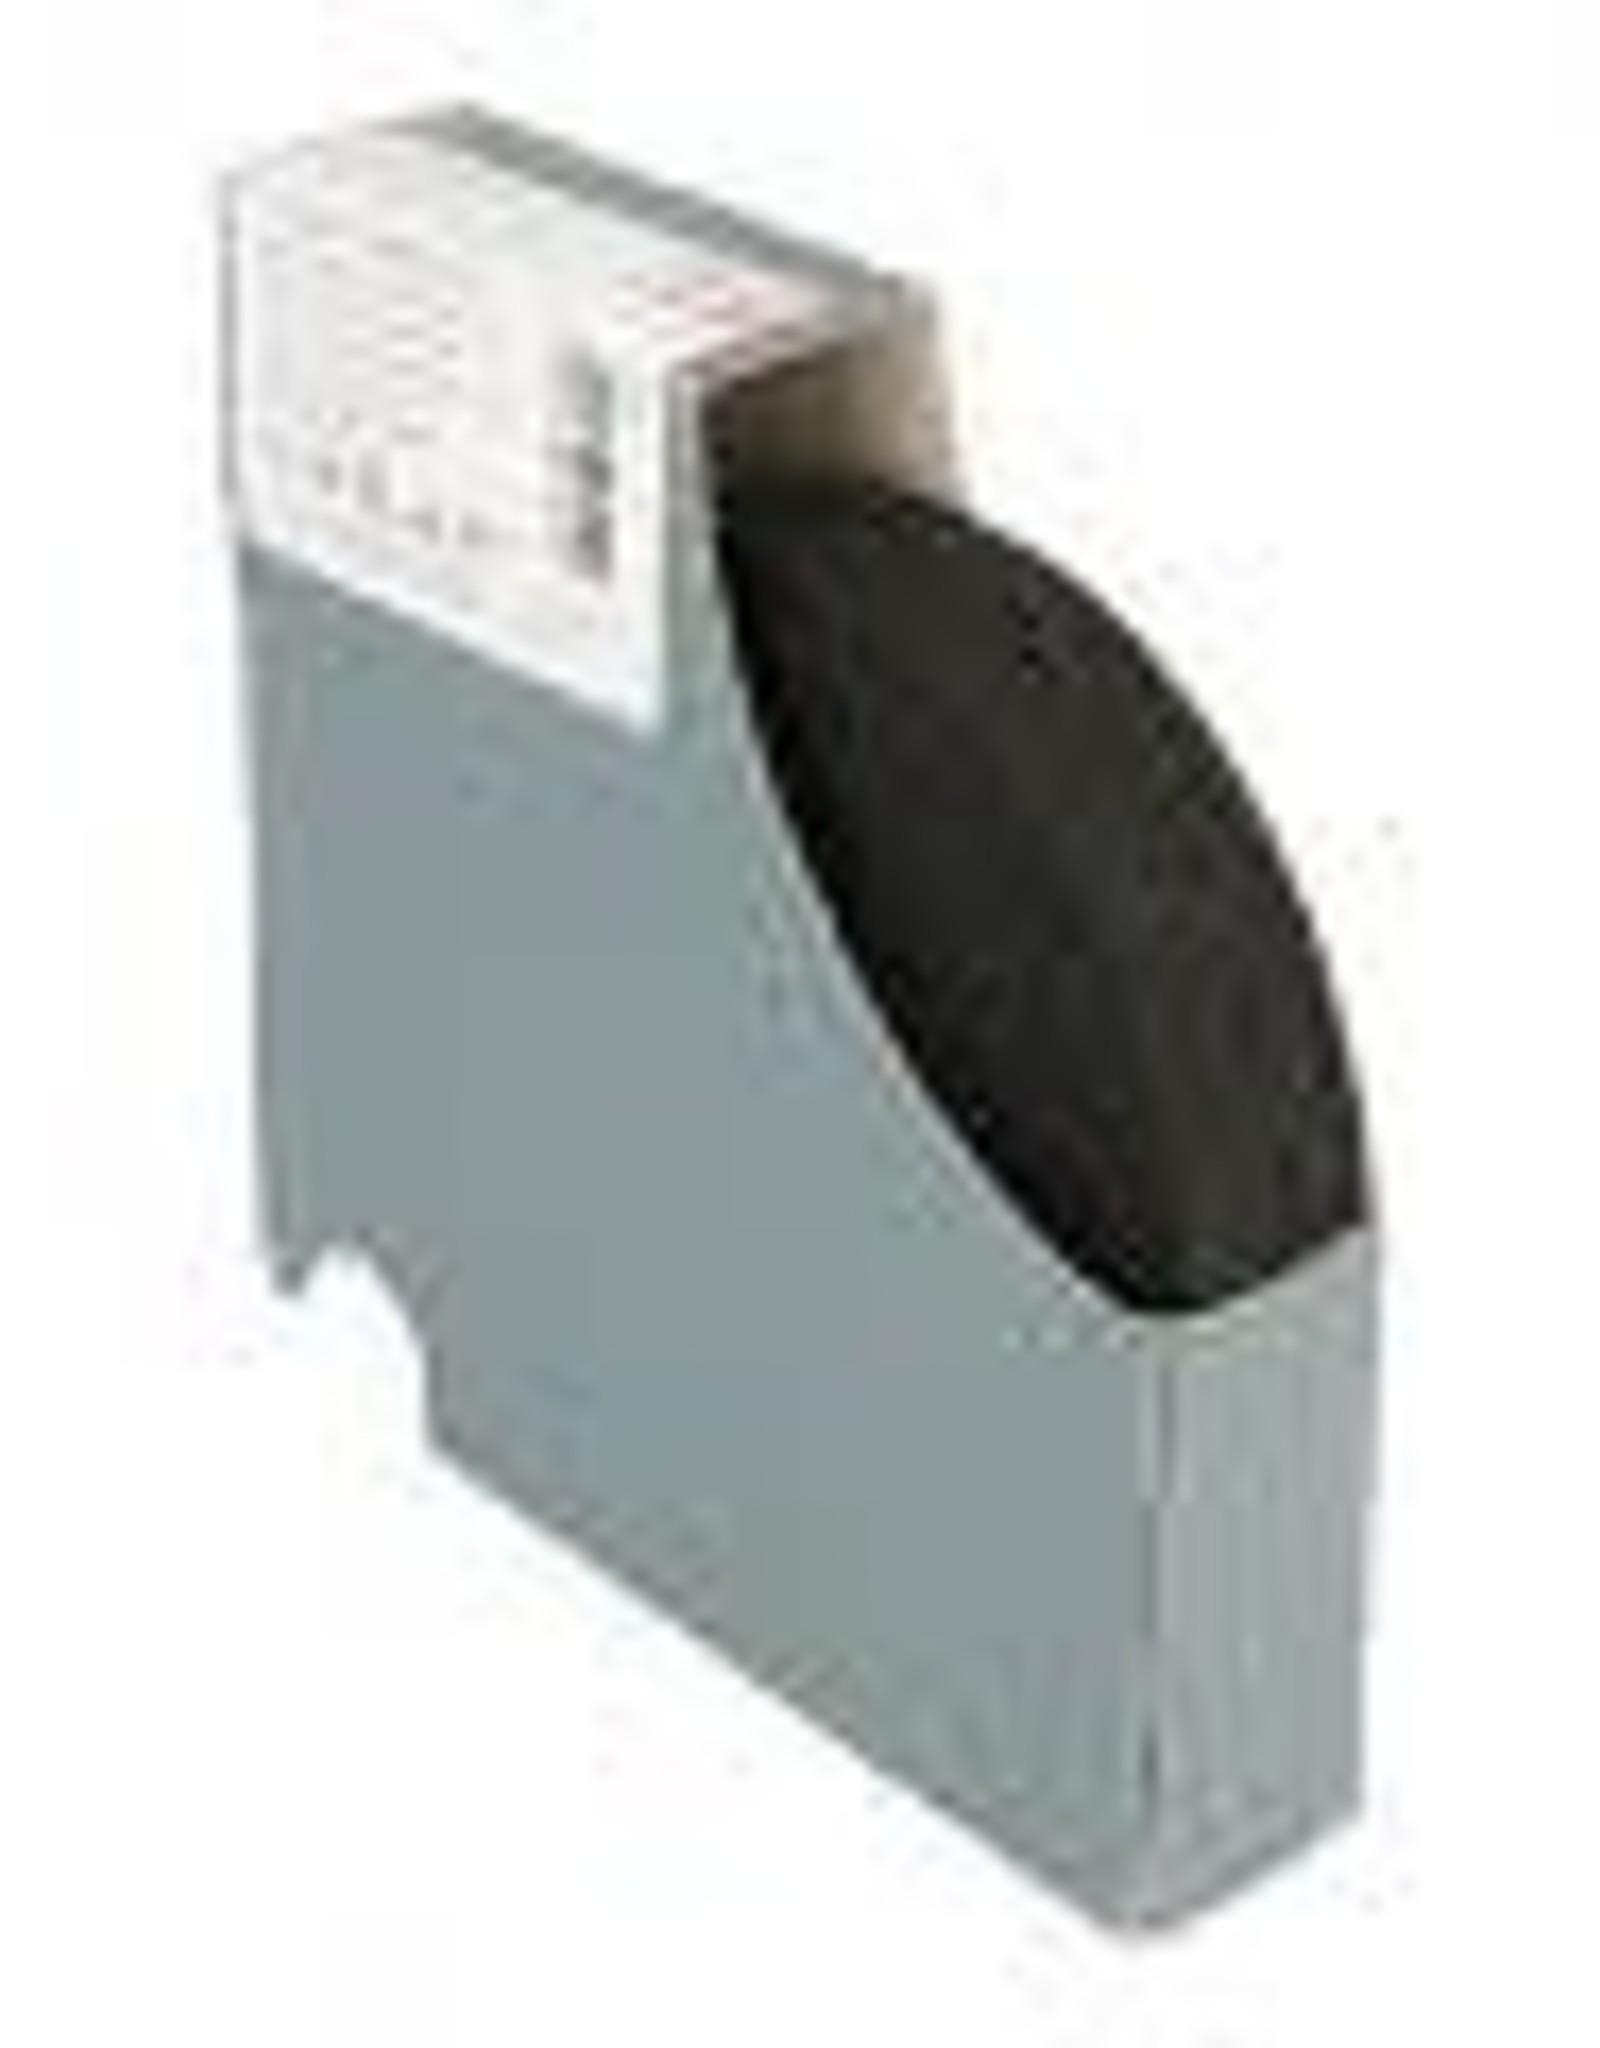 Prym Prym knoopsgatenelastiek 25 mm zwart